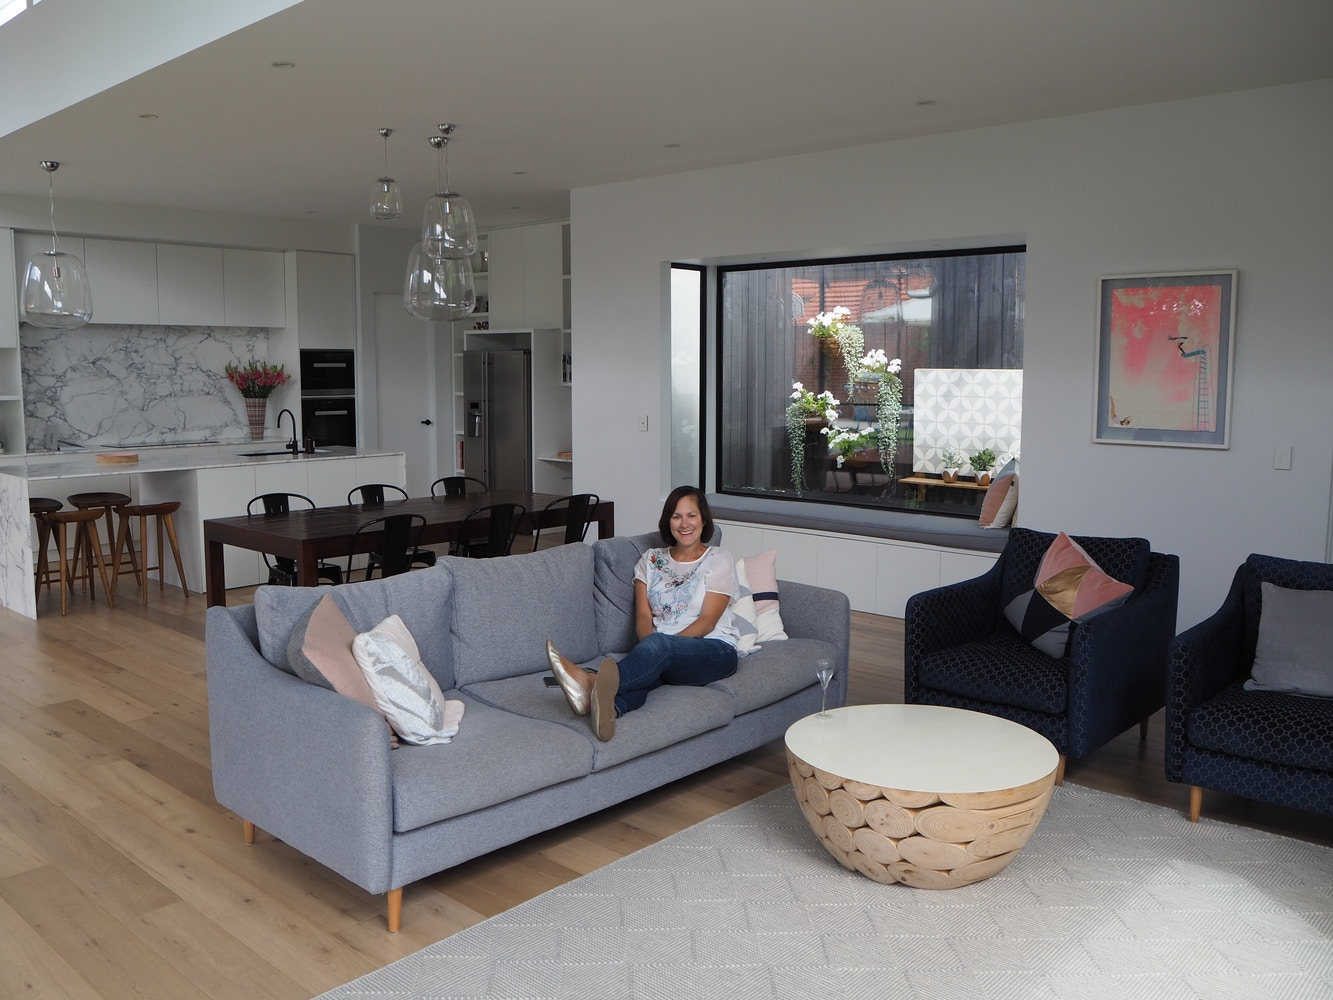 Introducing Interior Decorator Anna Wood of Wood Design Co.